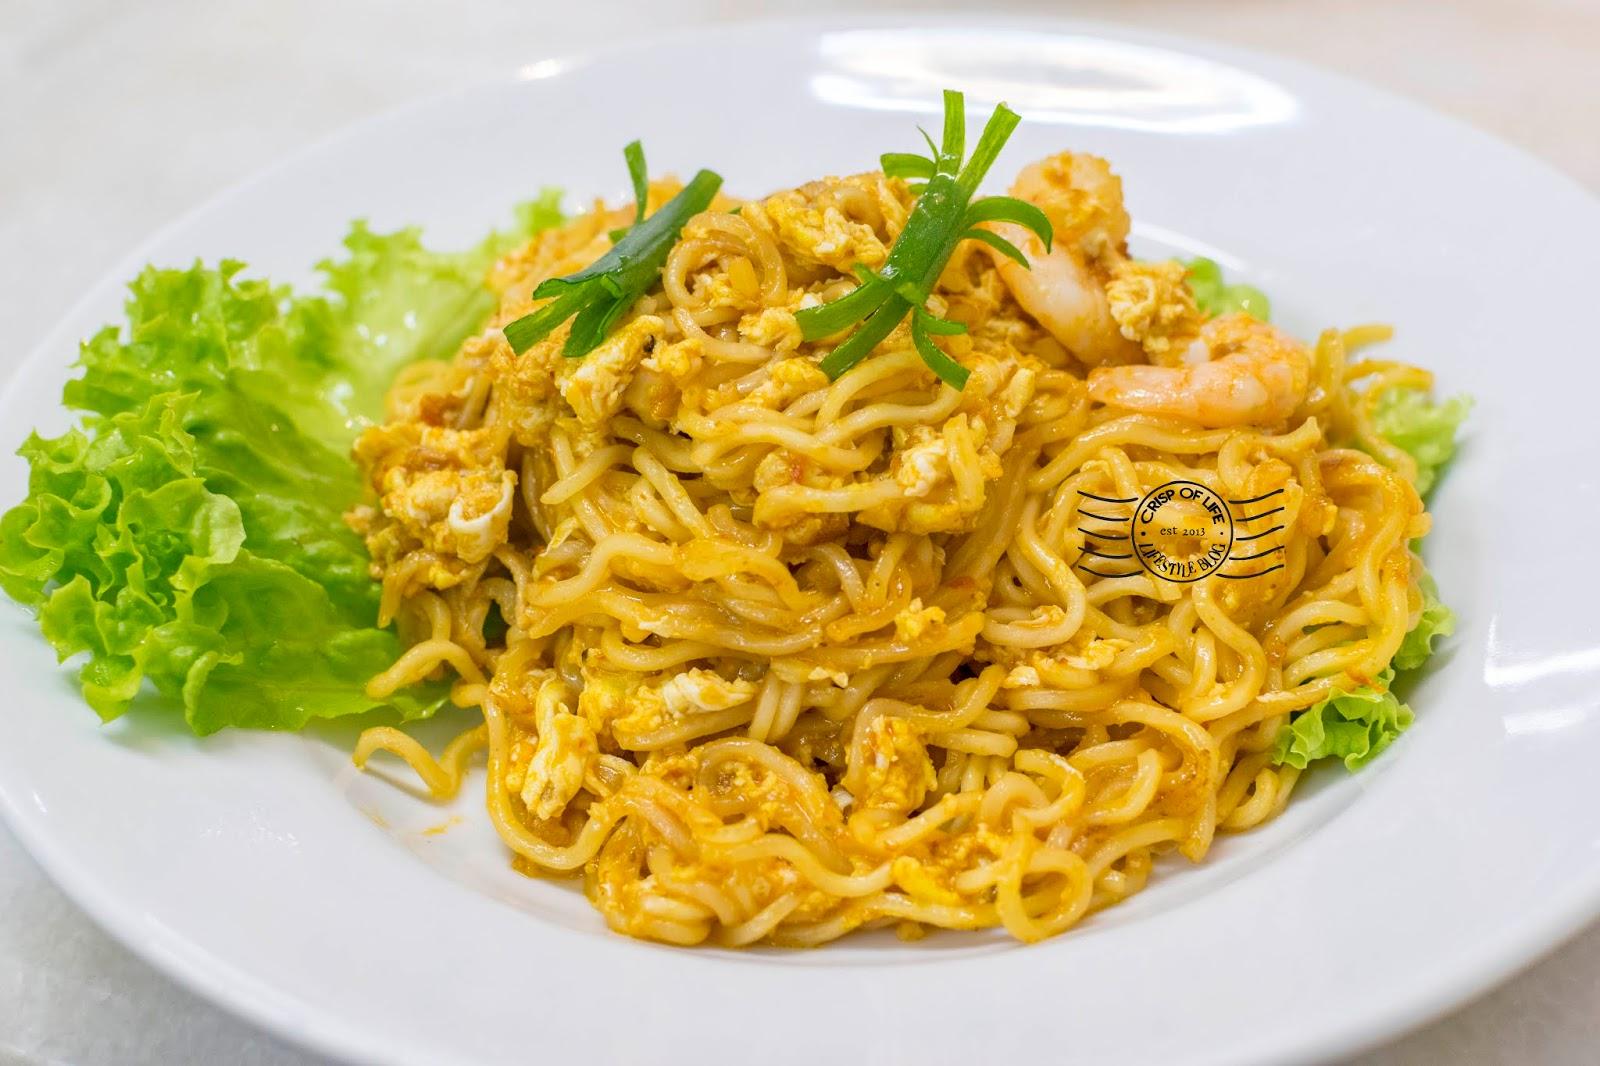 Kio Ka Noodles at Lebuh Bishop, Georgetown, Penang